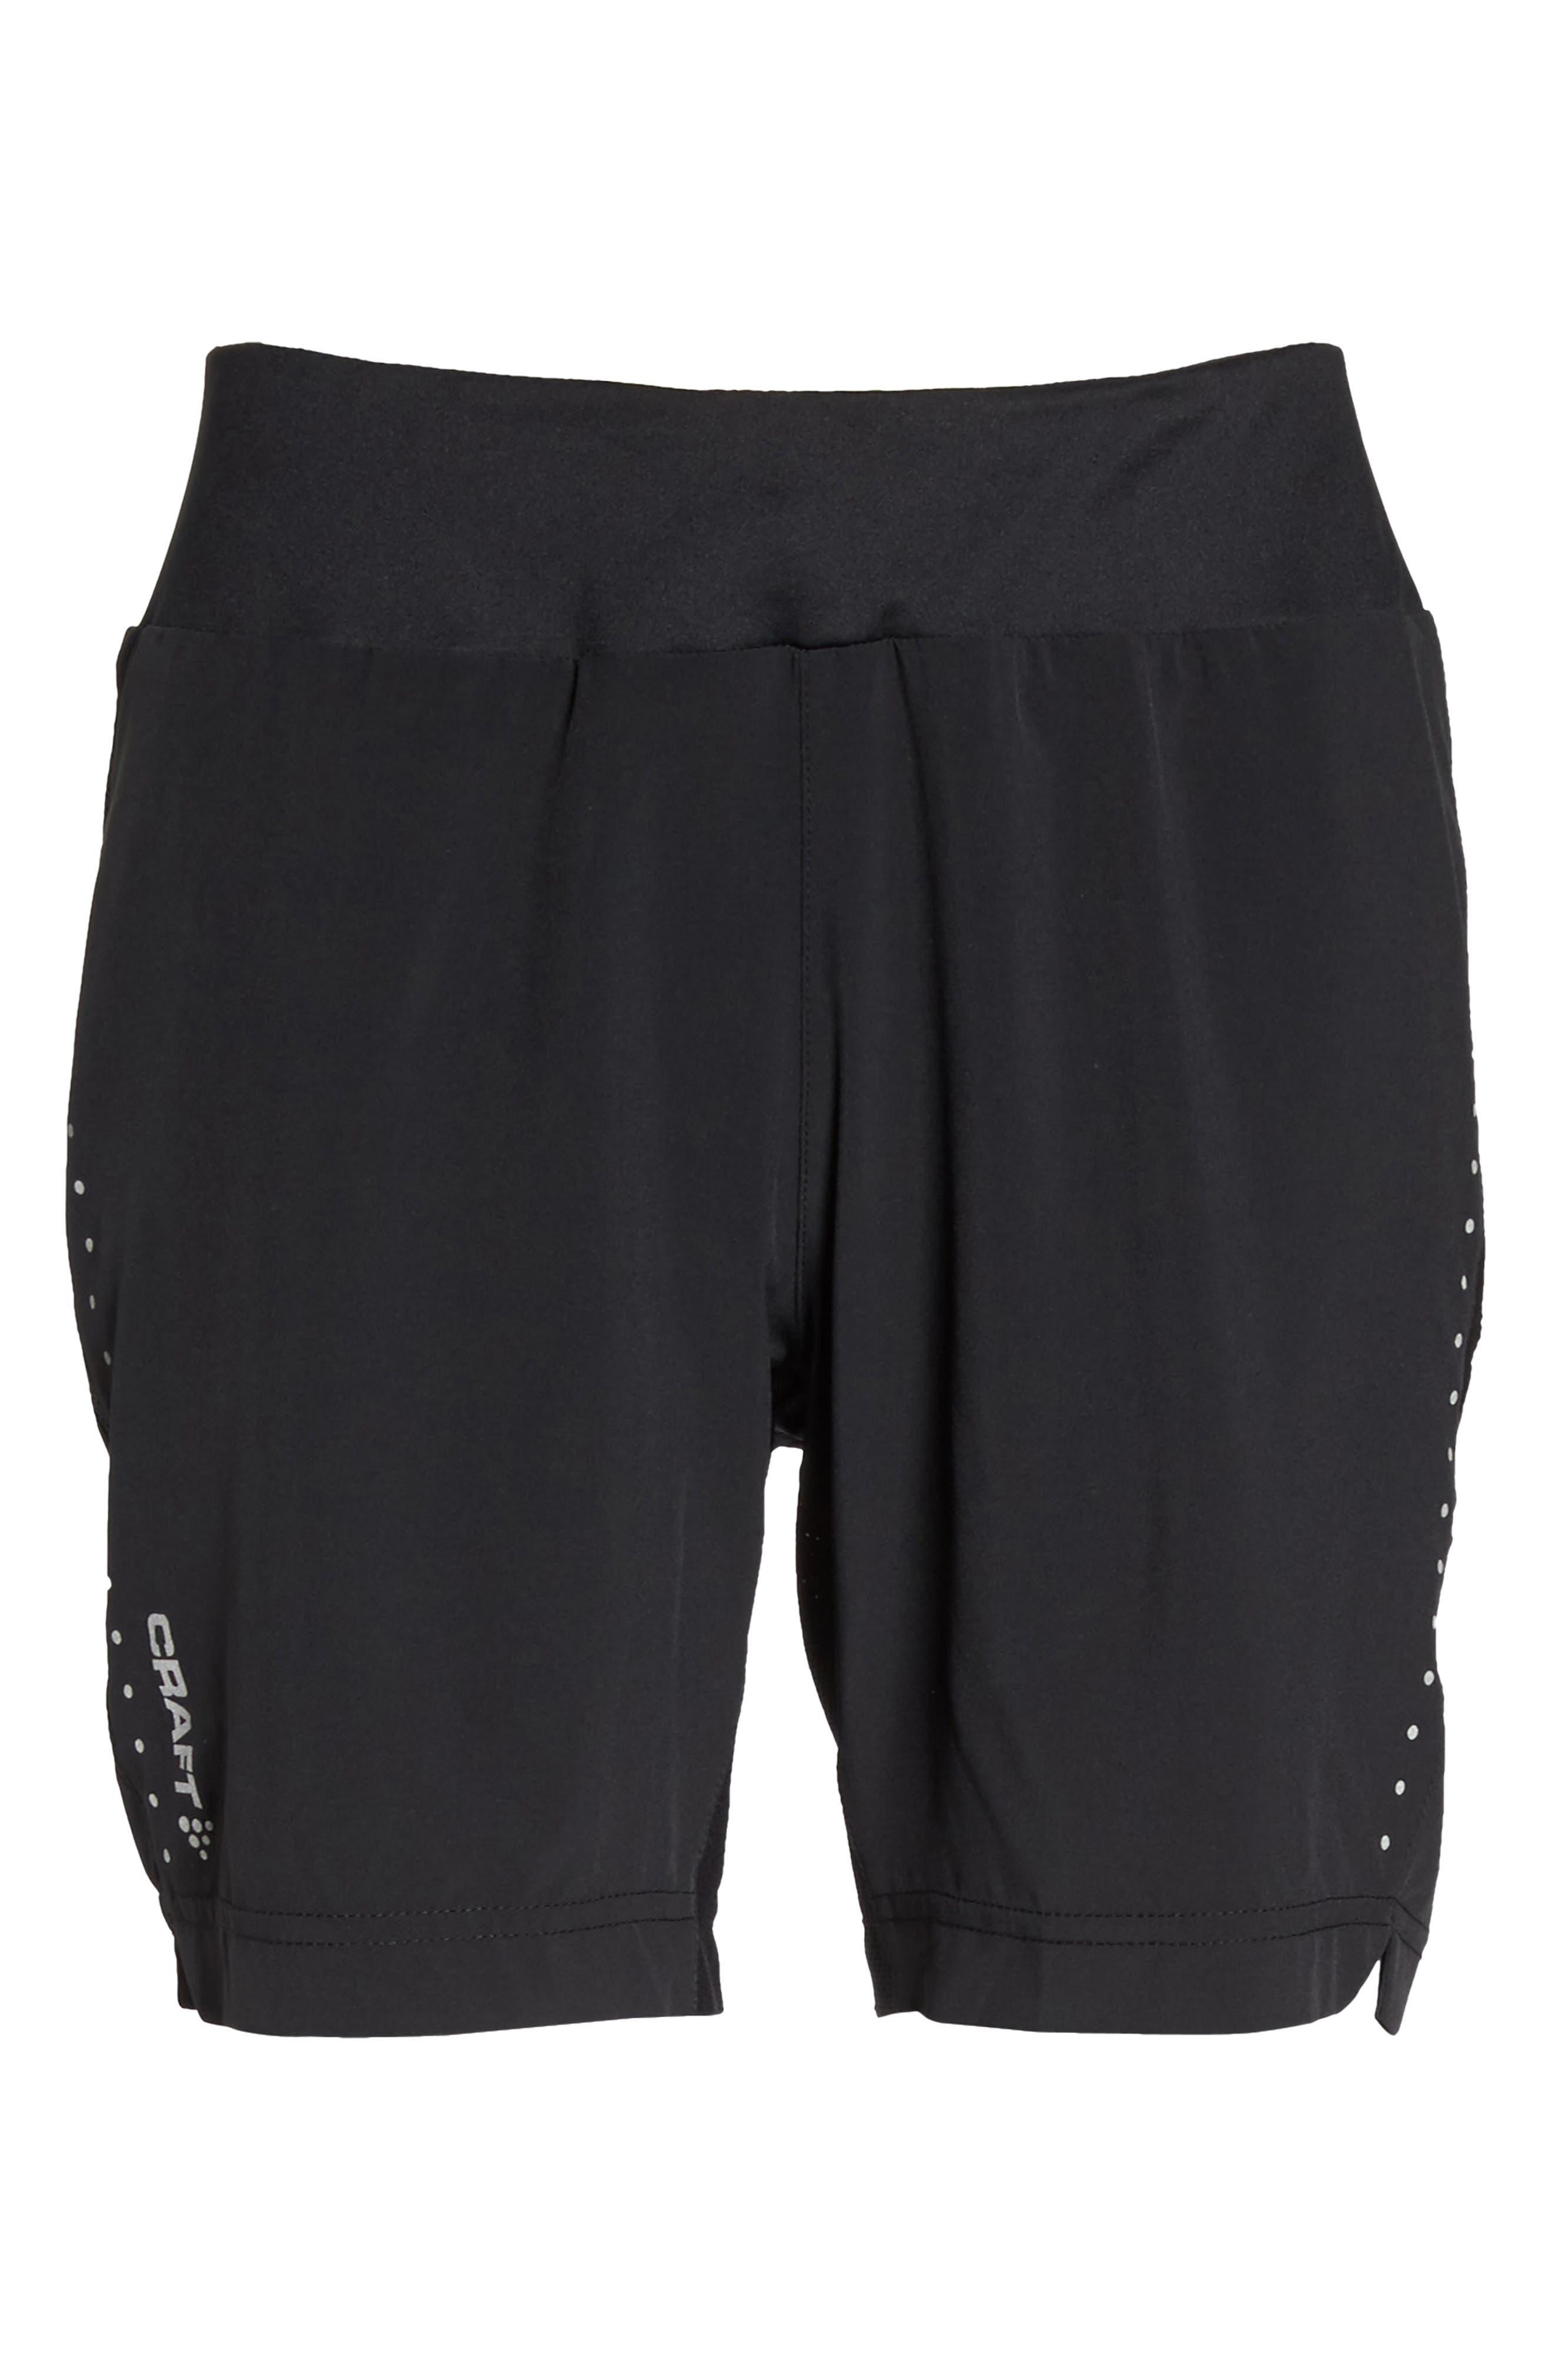 Essential Shorts,                             Alternate thumbnail 7, color,                             Black